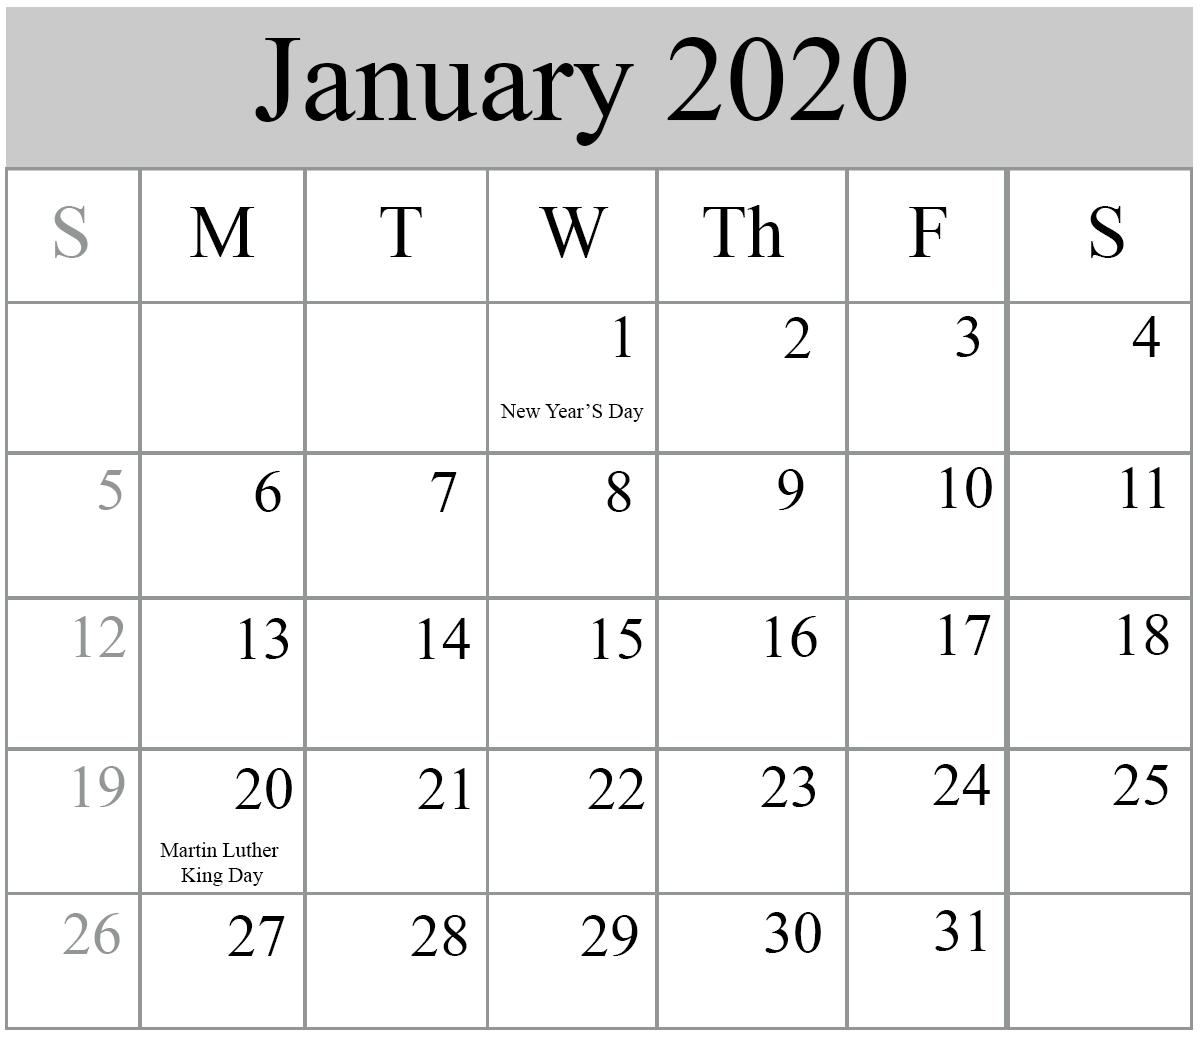 Free Blank January 2020 Calendar Printable In Pdf, Word-Printable January 2020 Calendar Word